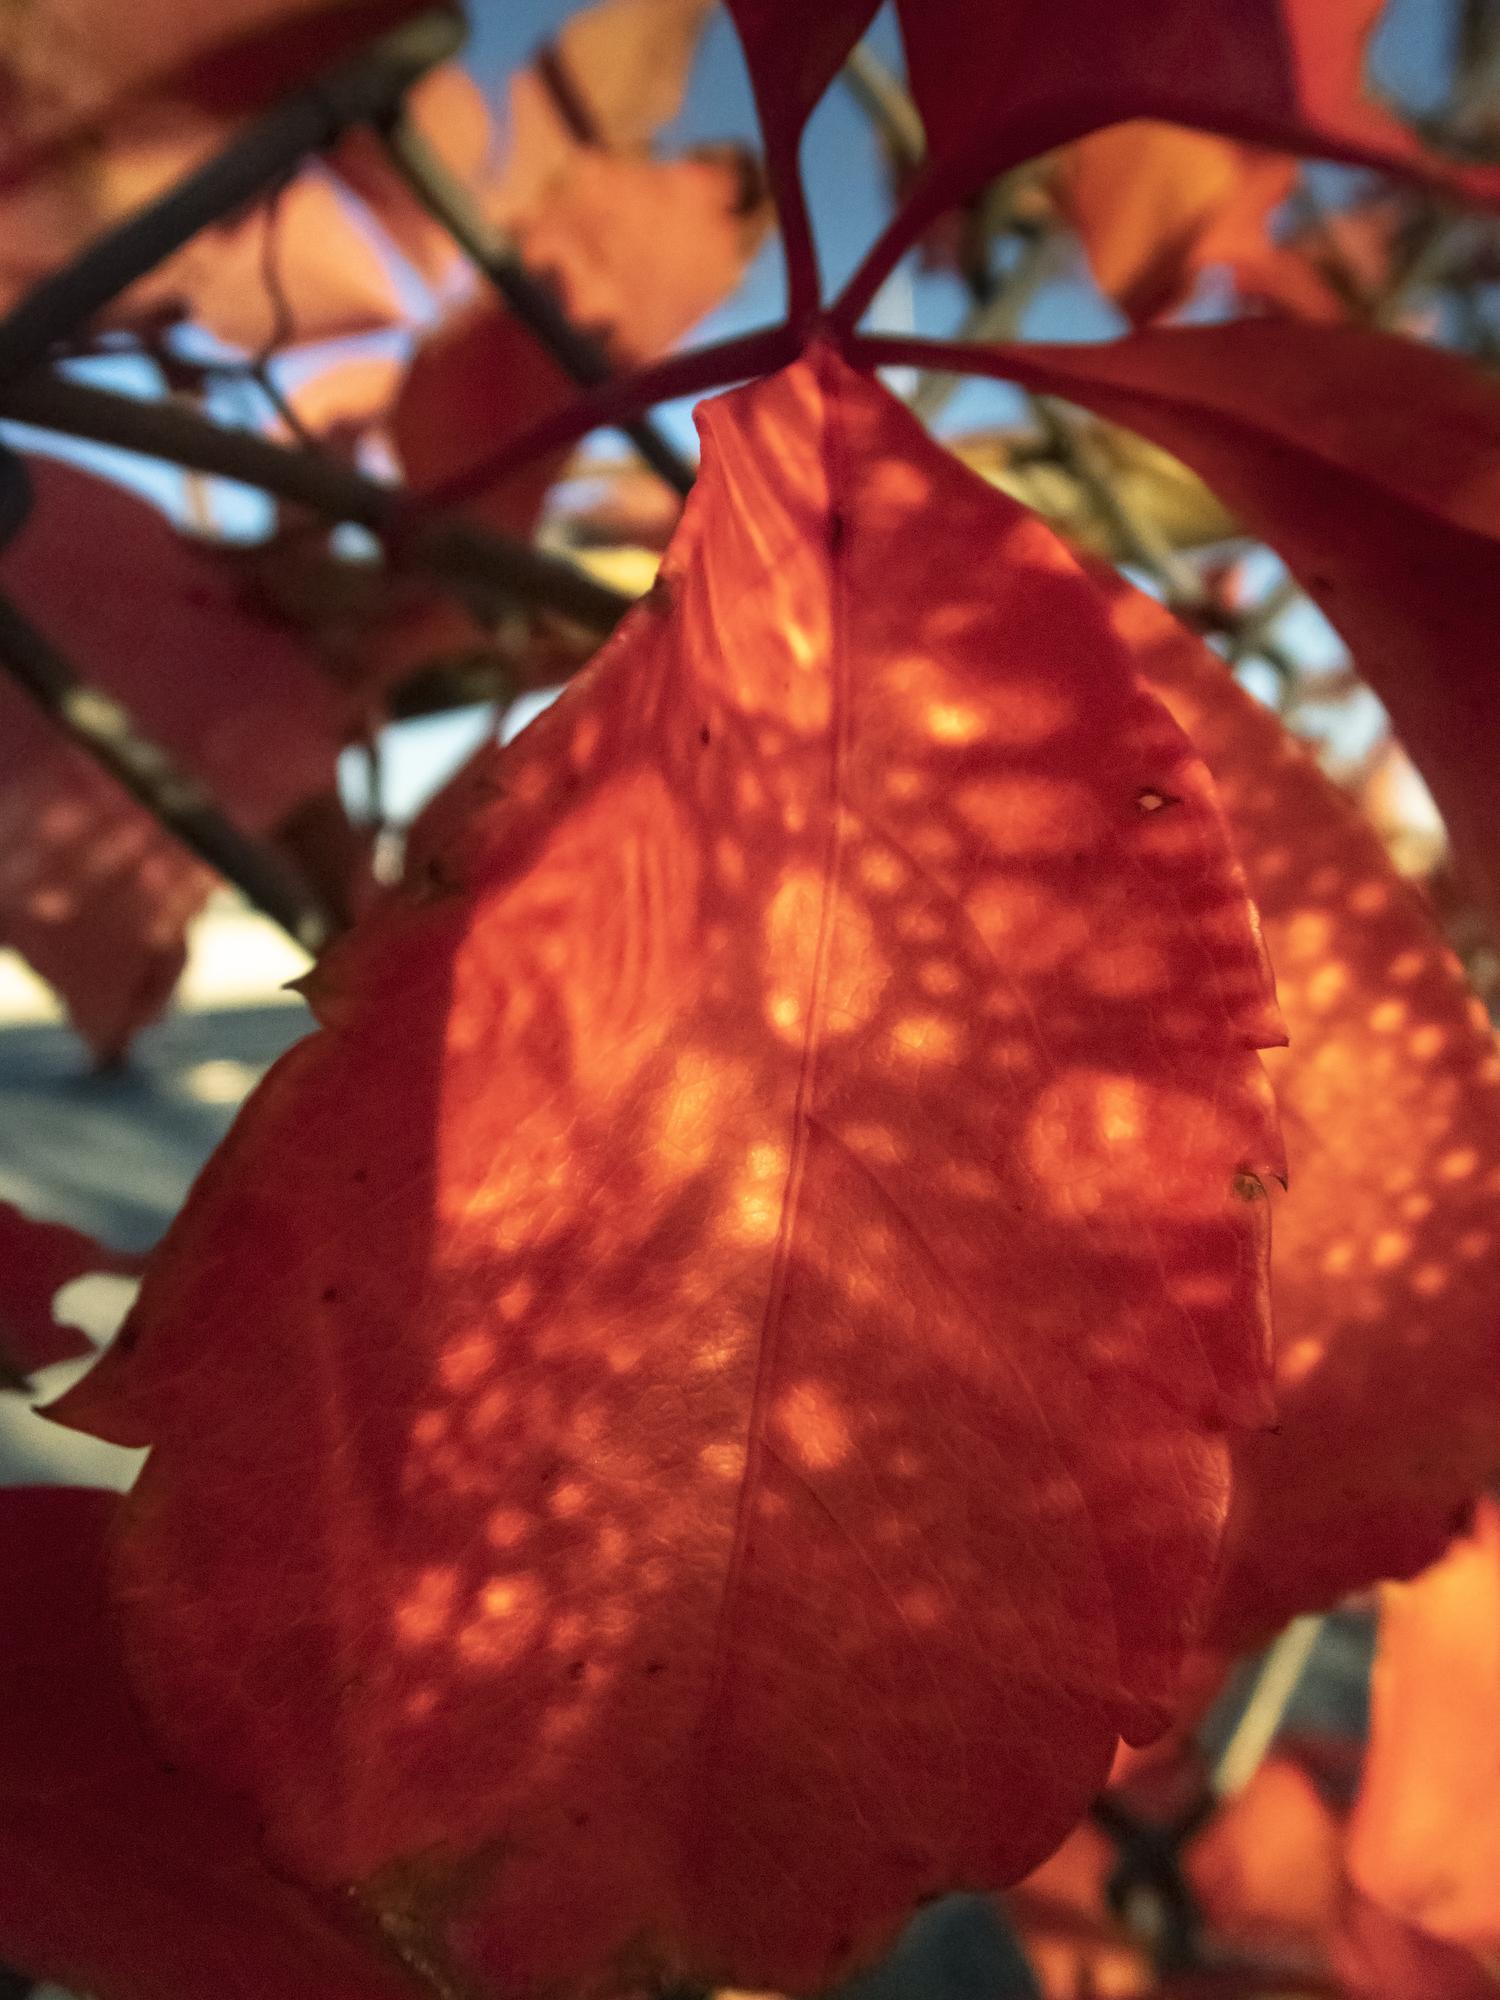 Red leaves (2019)  - 20 x 15 pulgadas- Edición de 5 + 2 P/A, Impresión Inkjet / Inkjet print